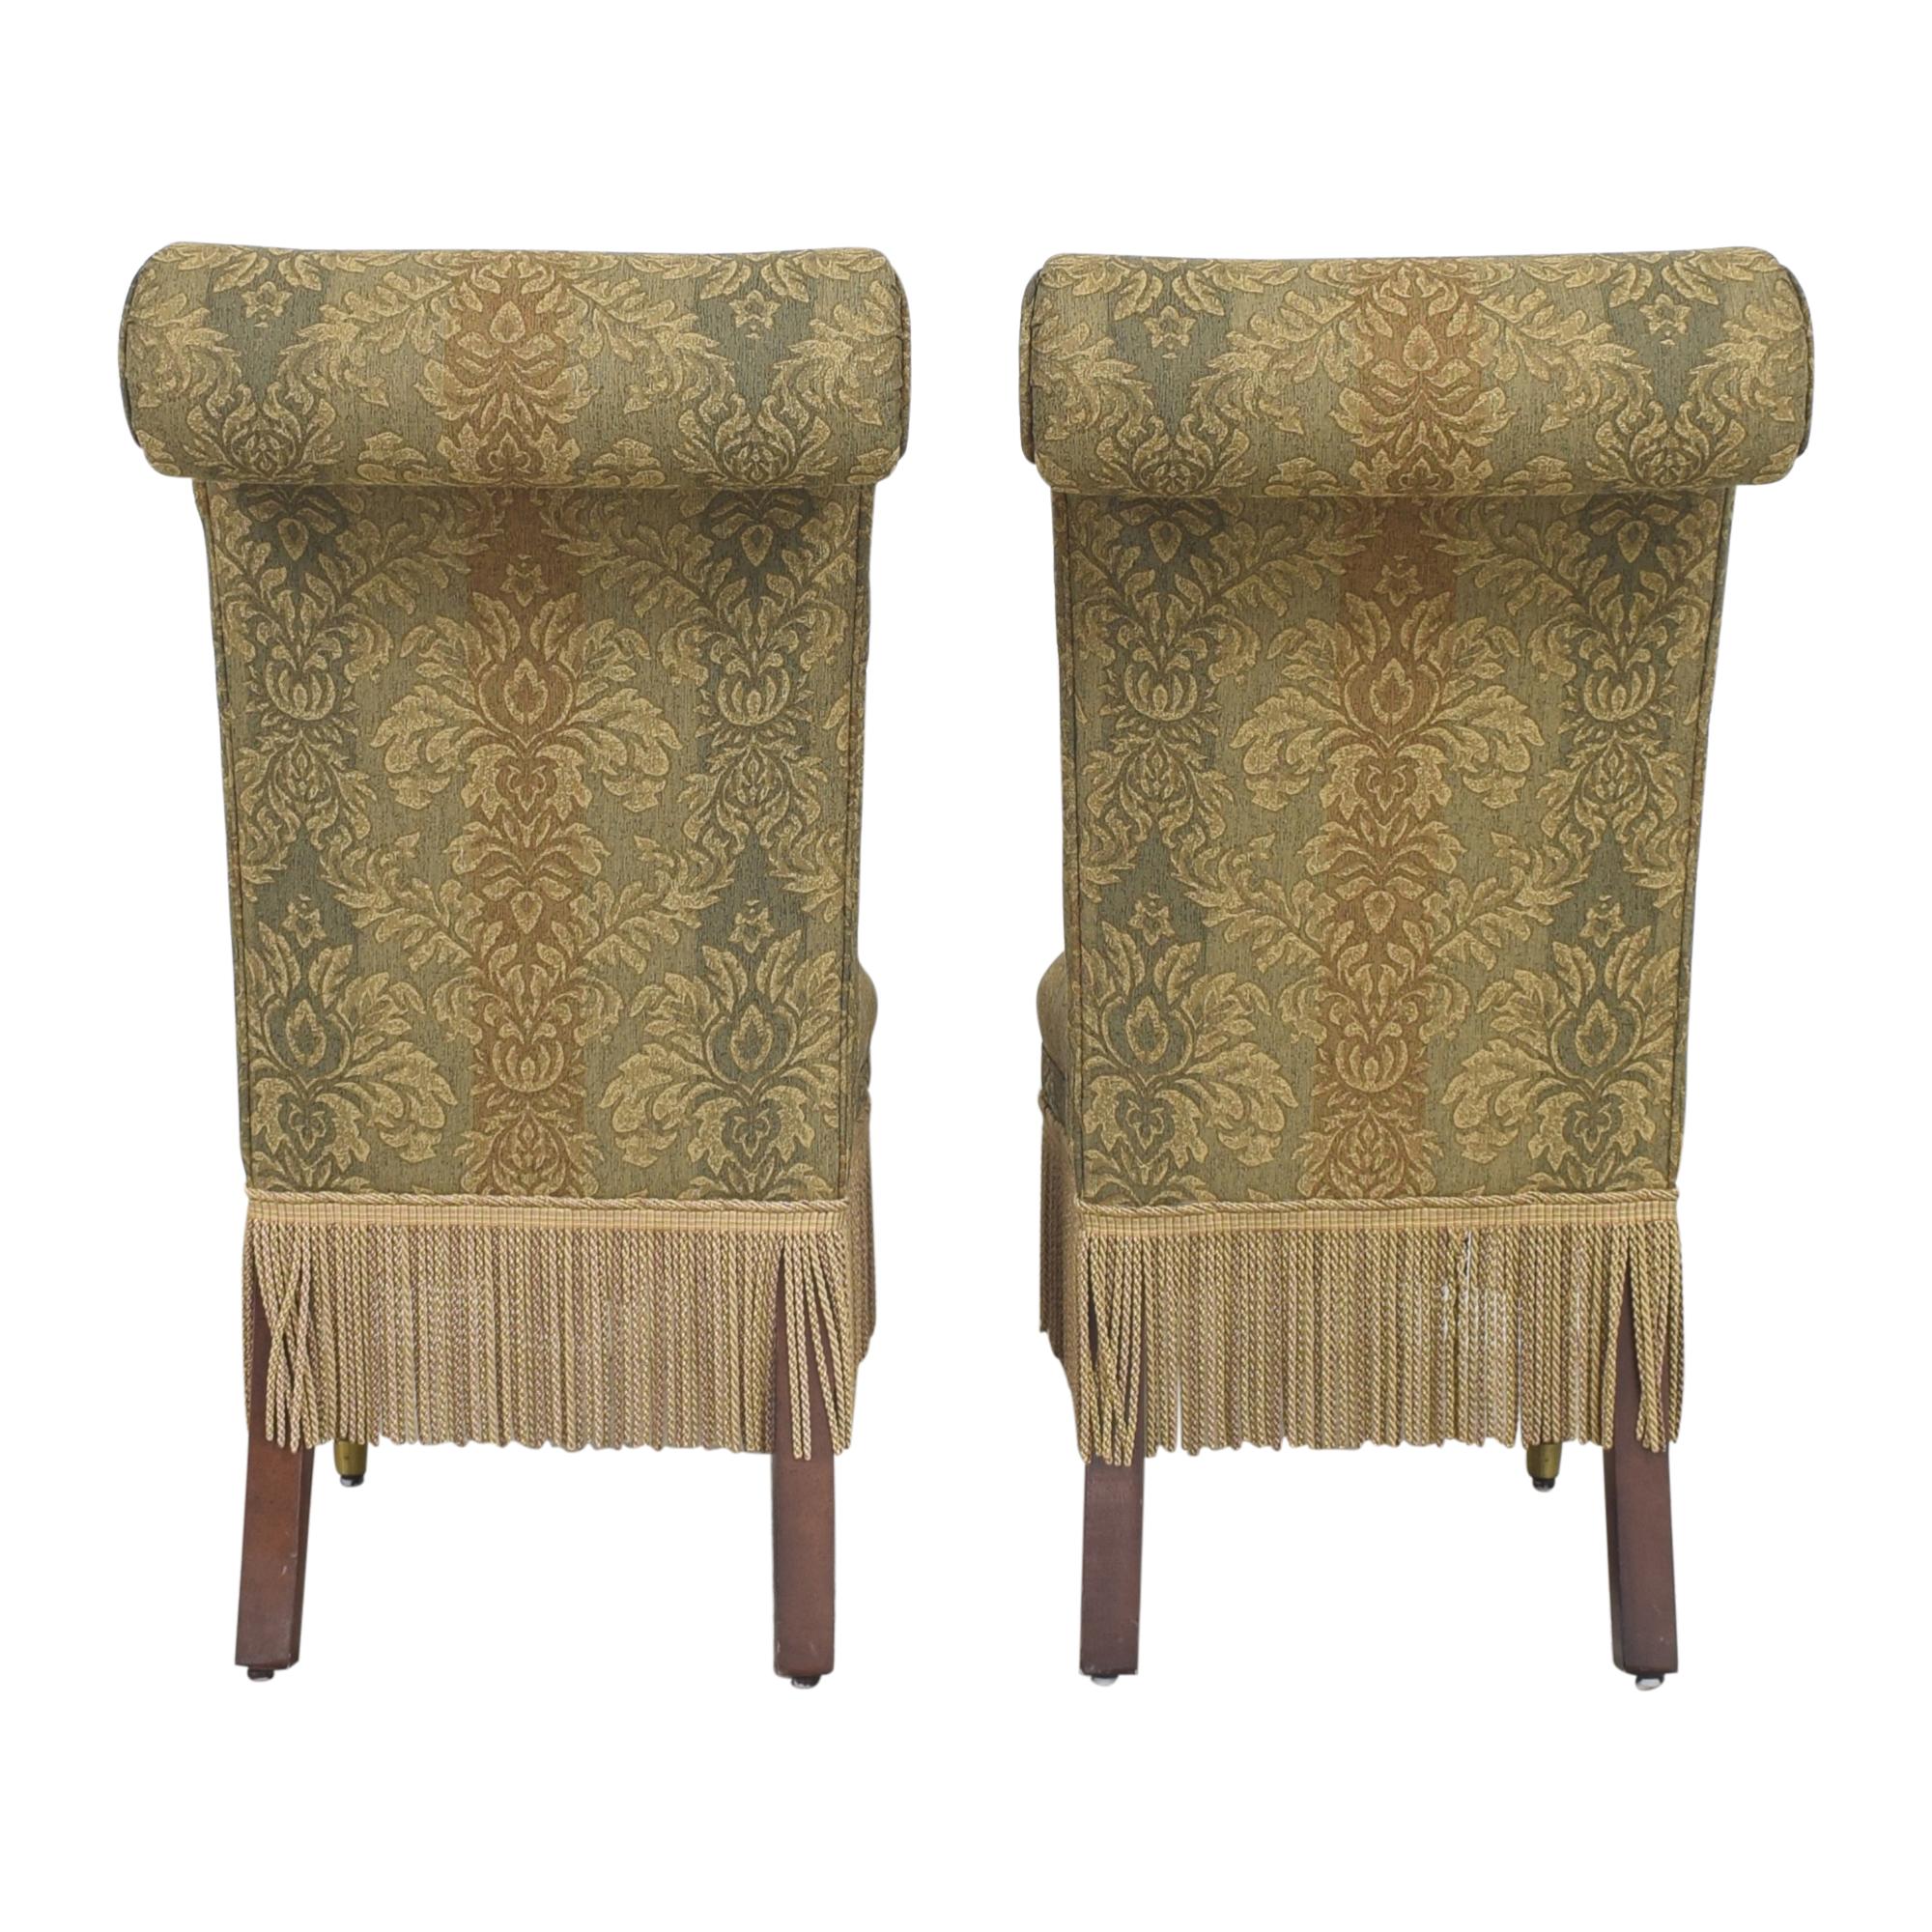 buy Designmaster Furniture Tasseled Dining Chairs Designmaster Furniture